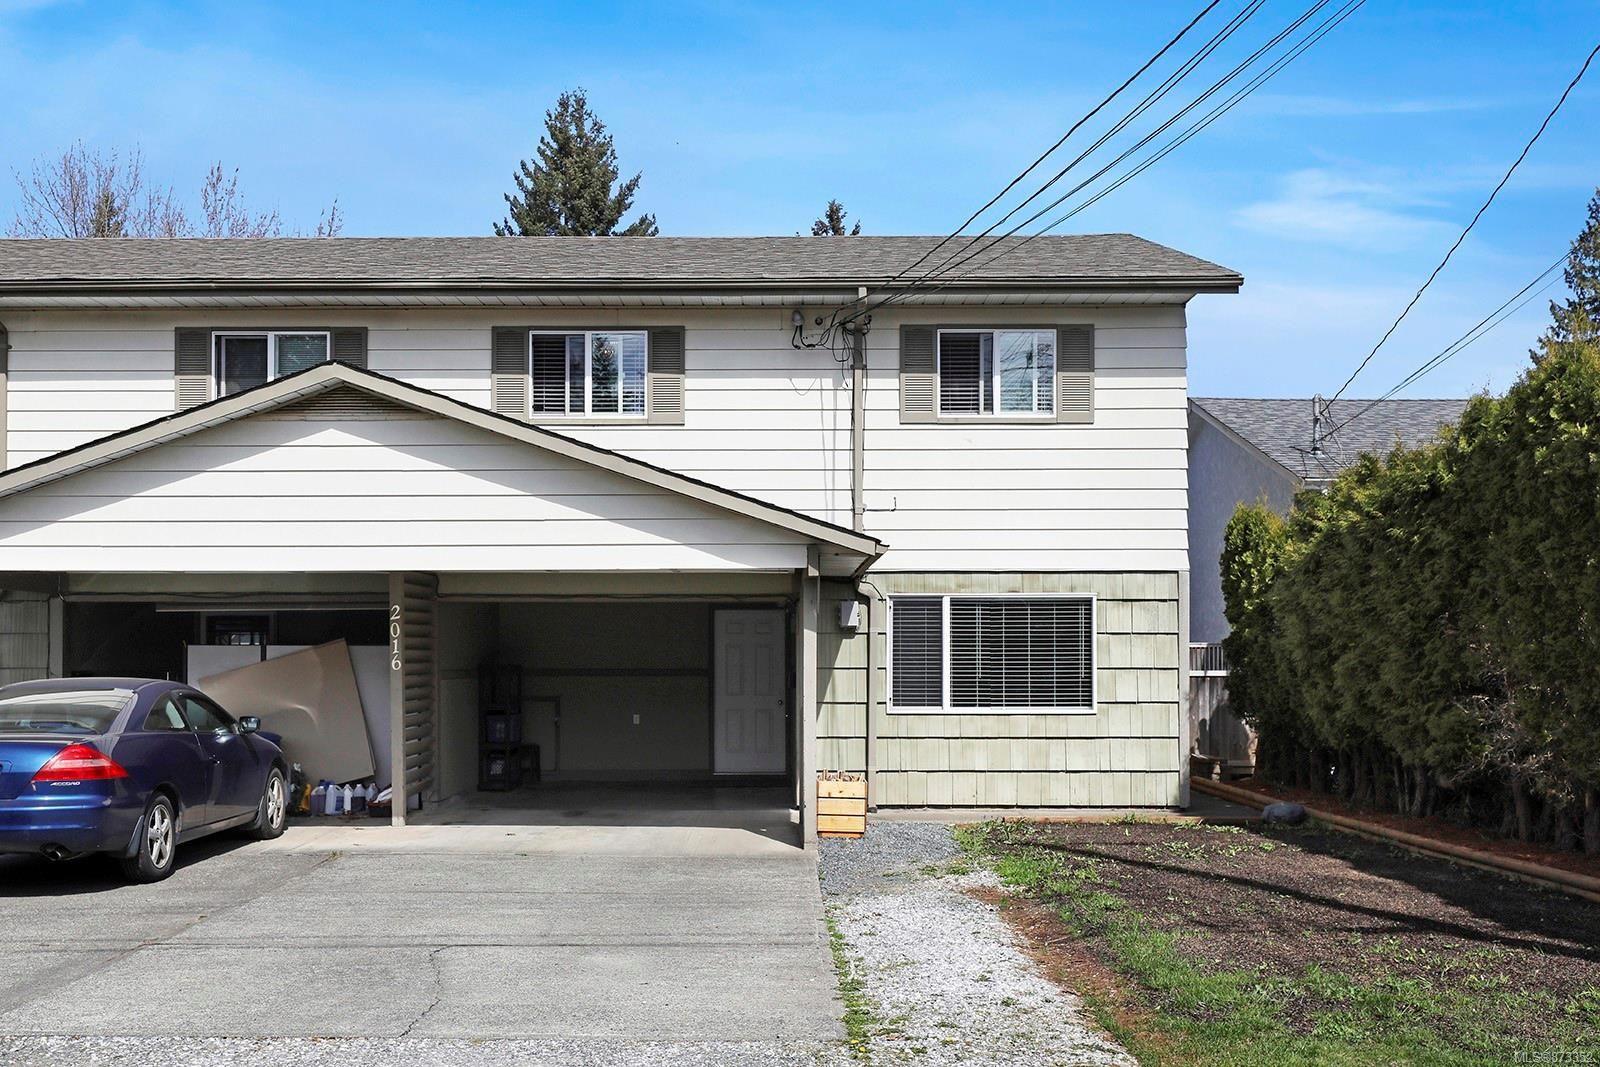 Main Photo: B 2016 Choquette Rd in : CV Courtenay City Half Duplex for sale (Comox Valley)  : MLS®# 873352